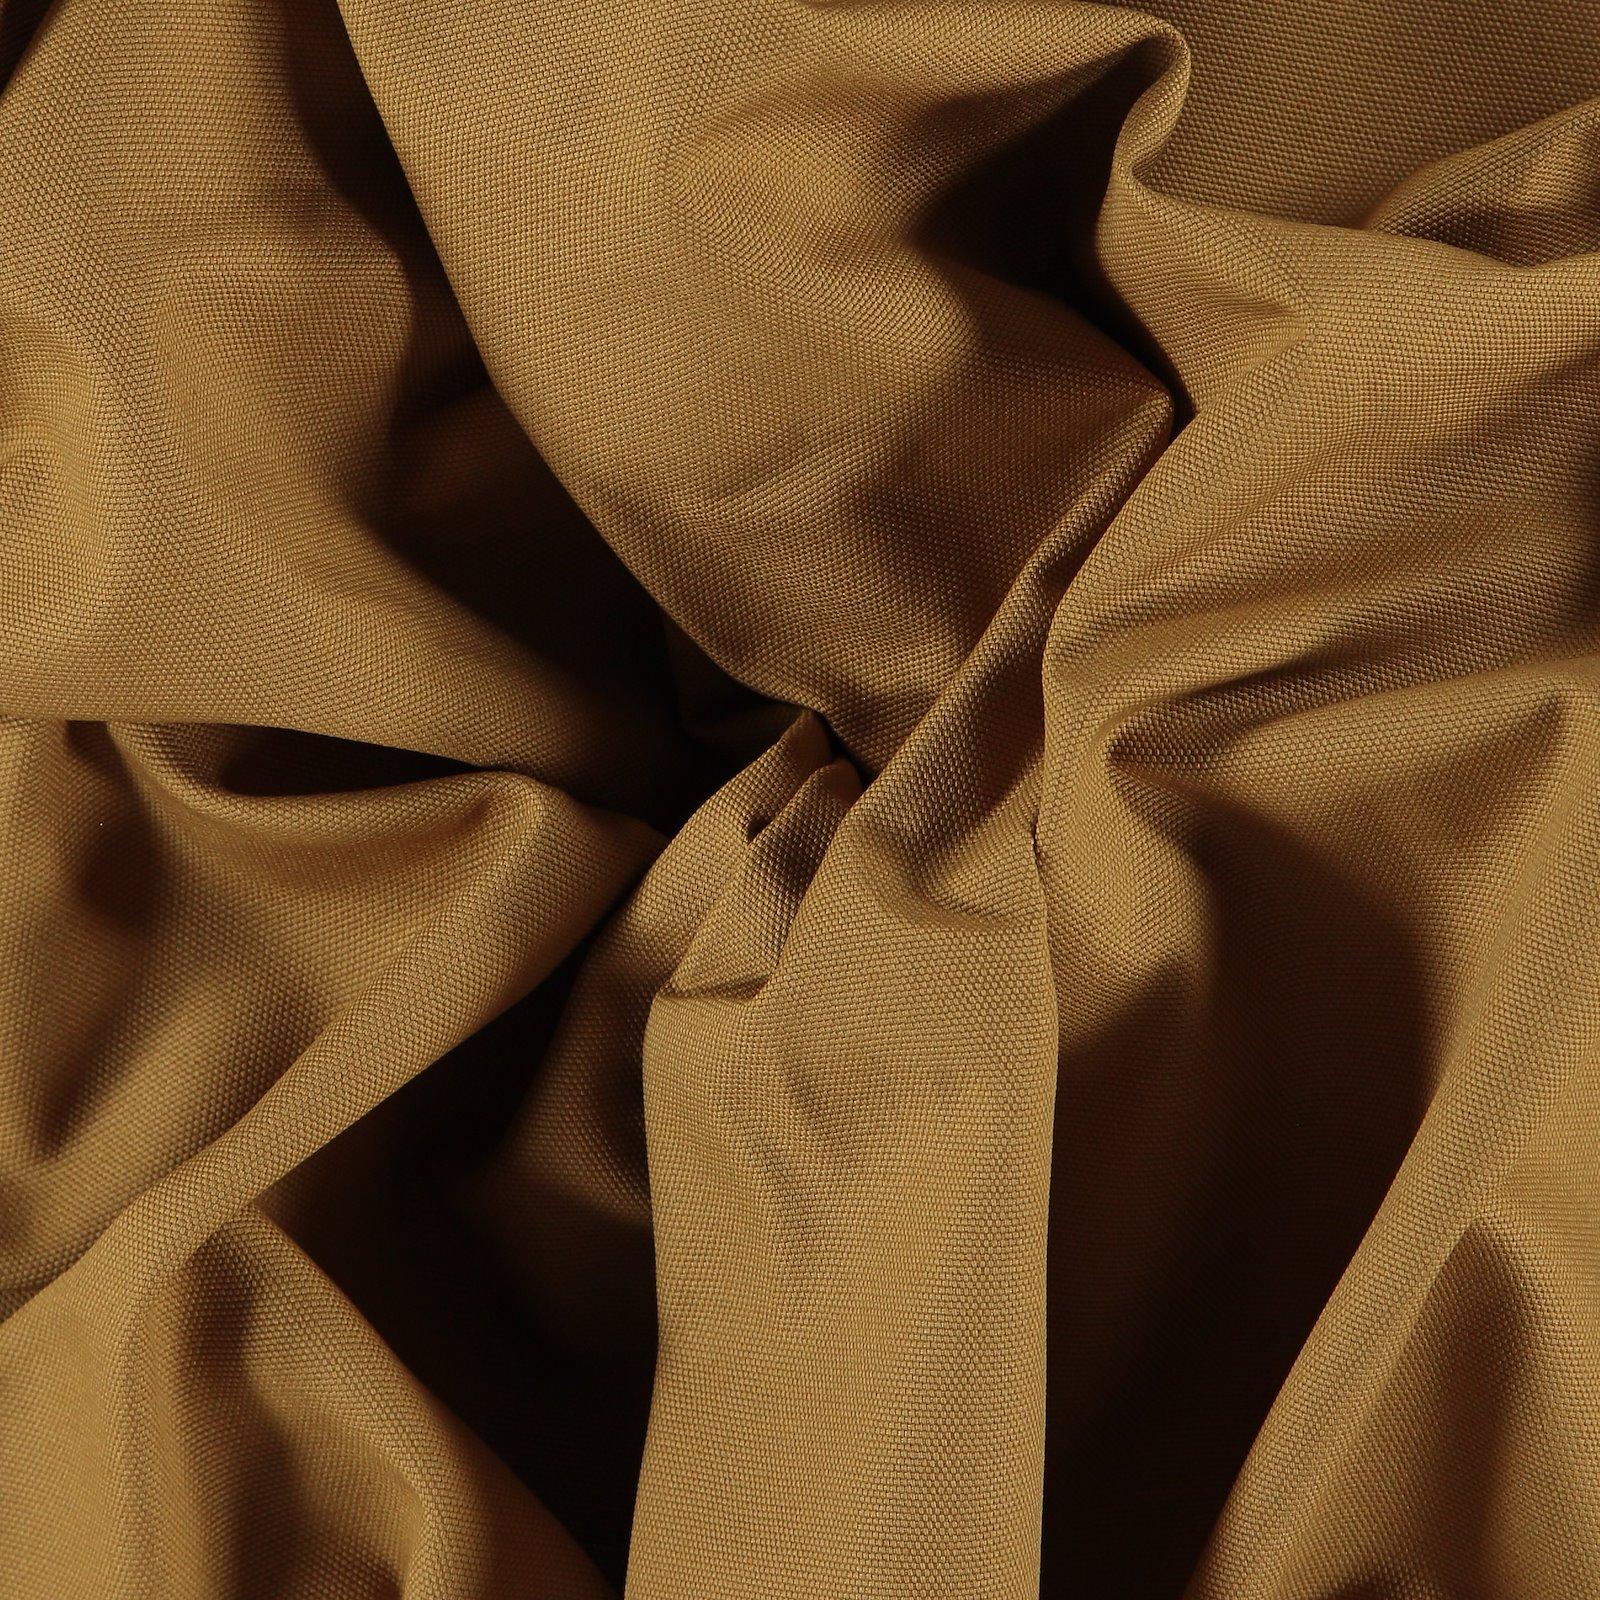 Cotton canvas light caramel